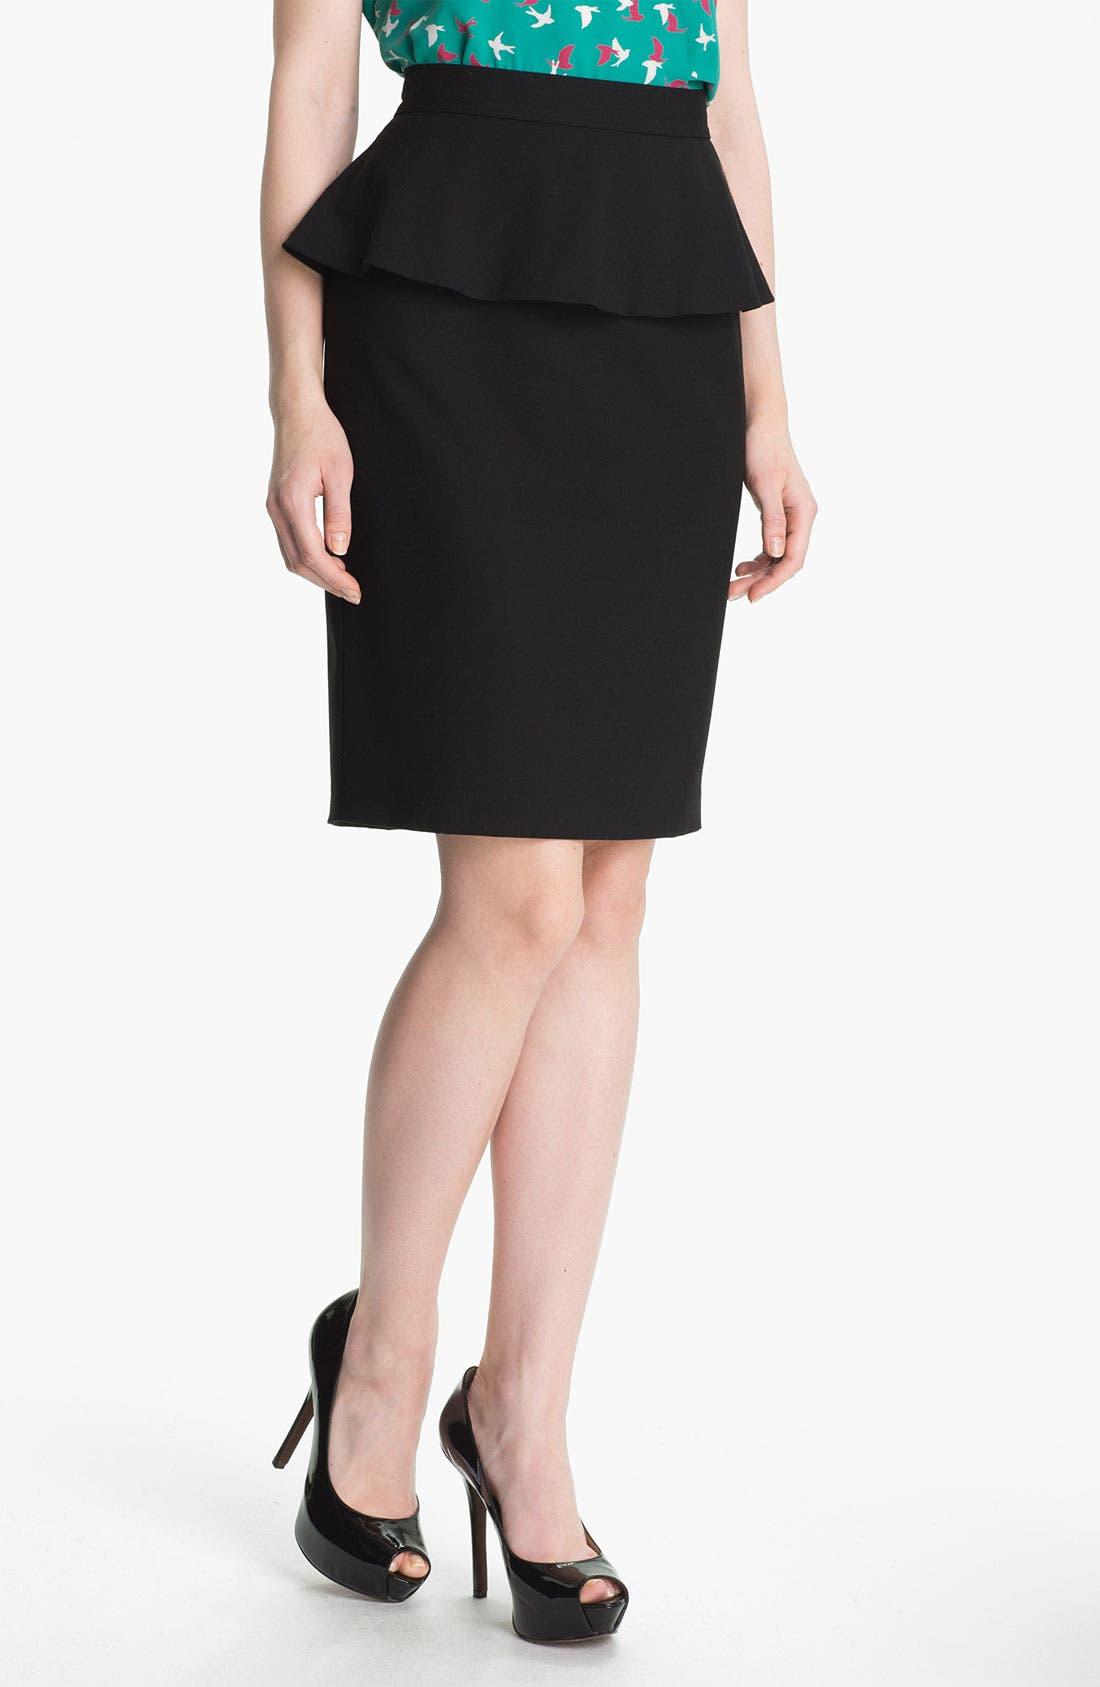 Alternate Image 1 Selected - Vince Camuto Peplum Pencil Skirt